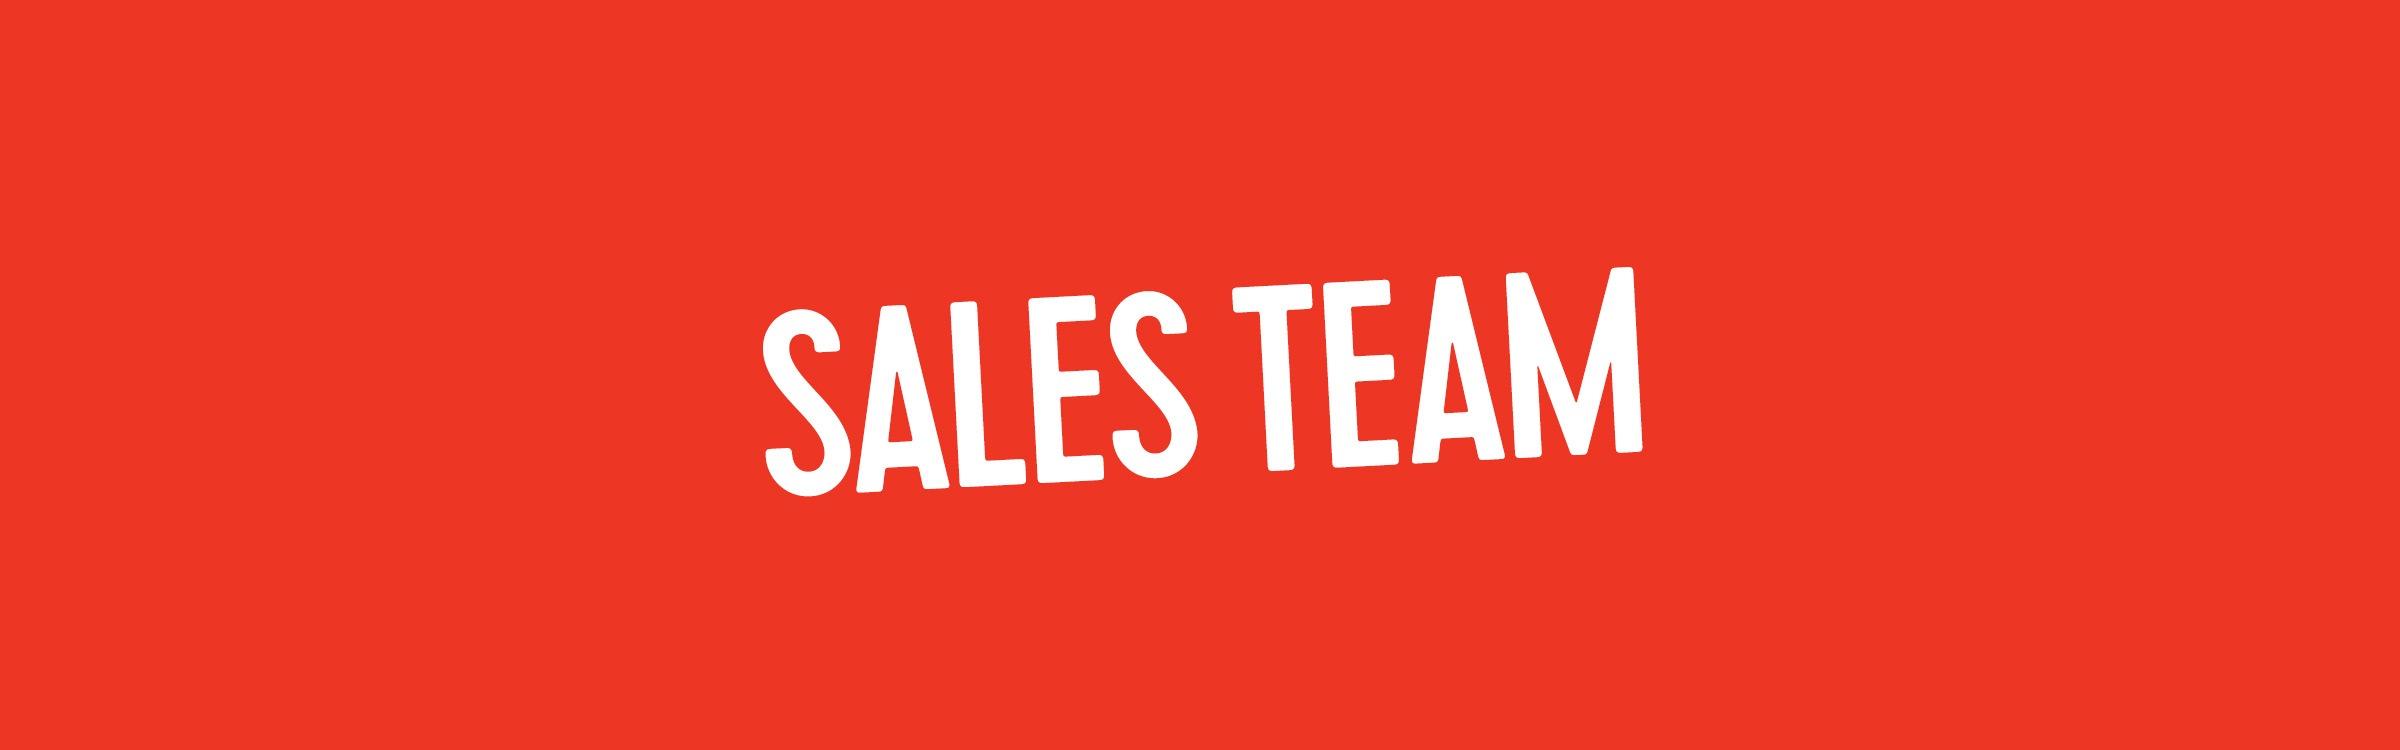 Qmusic actionheader sales2018 sales